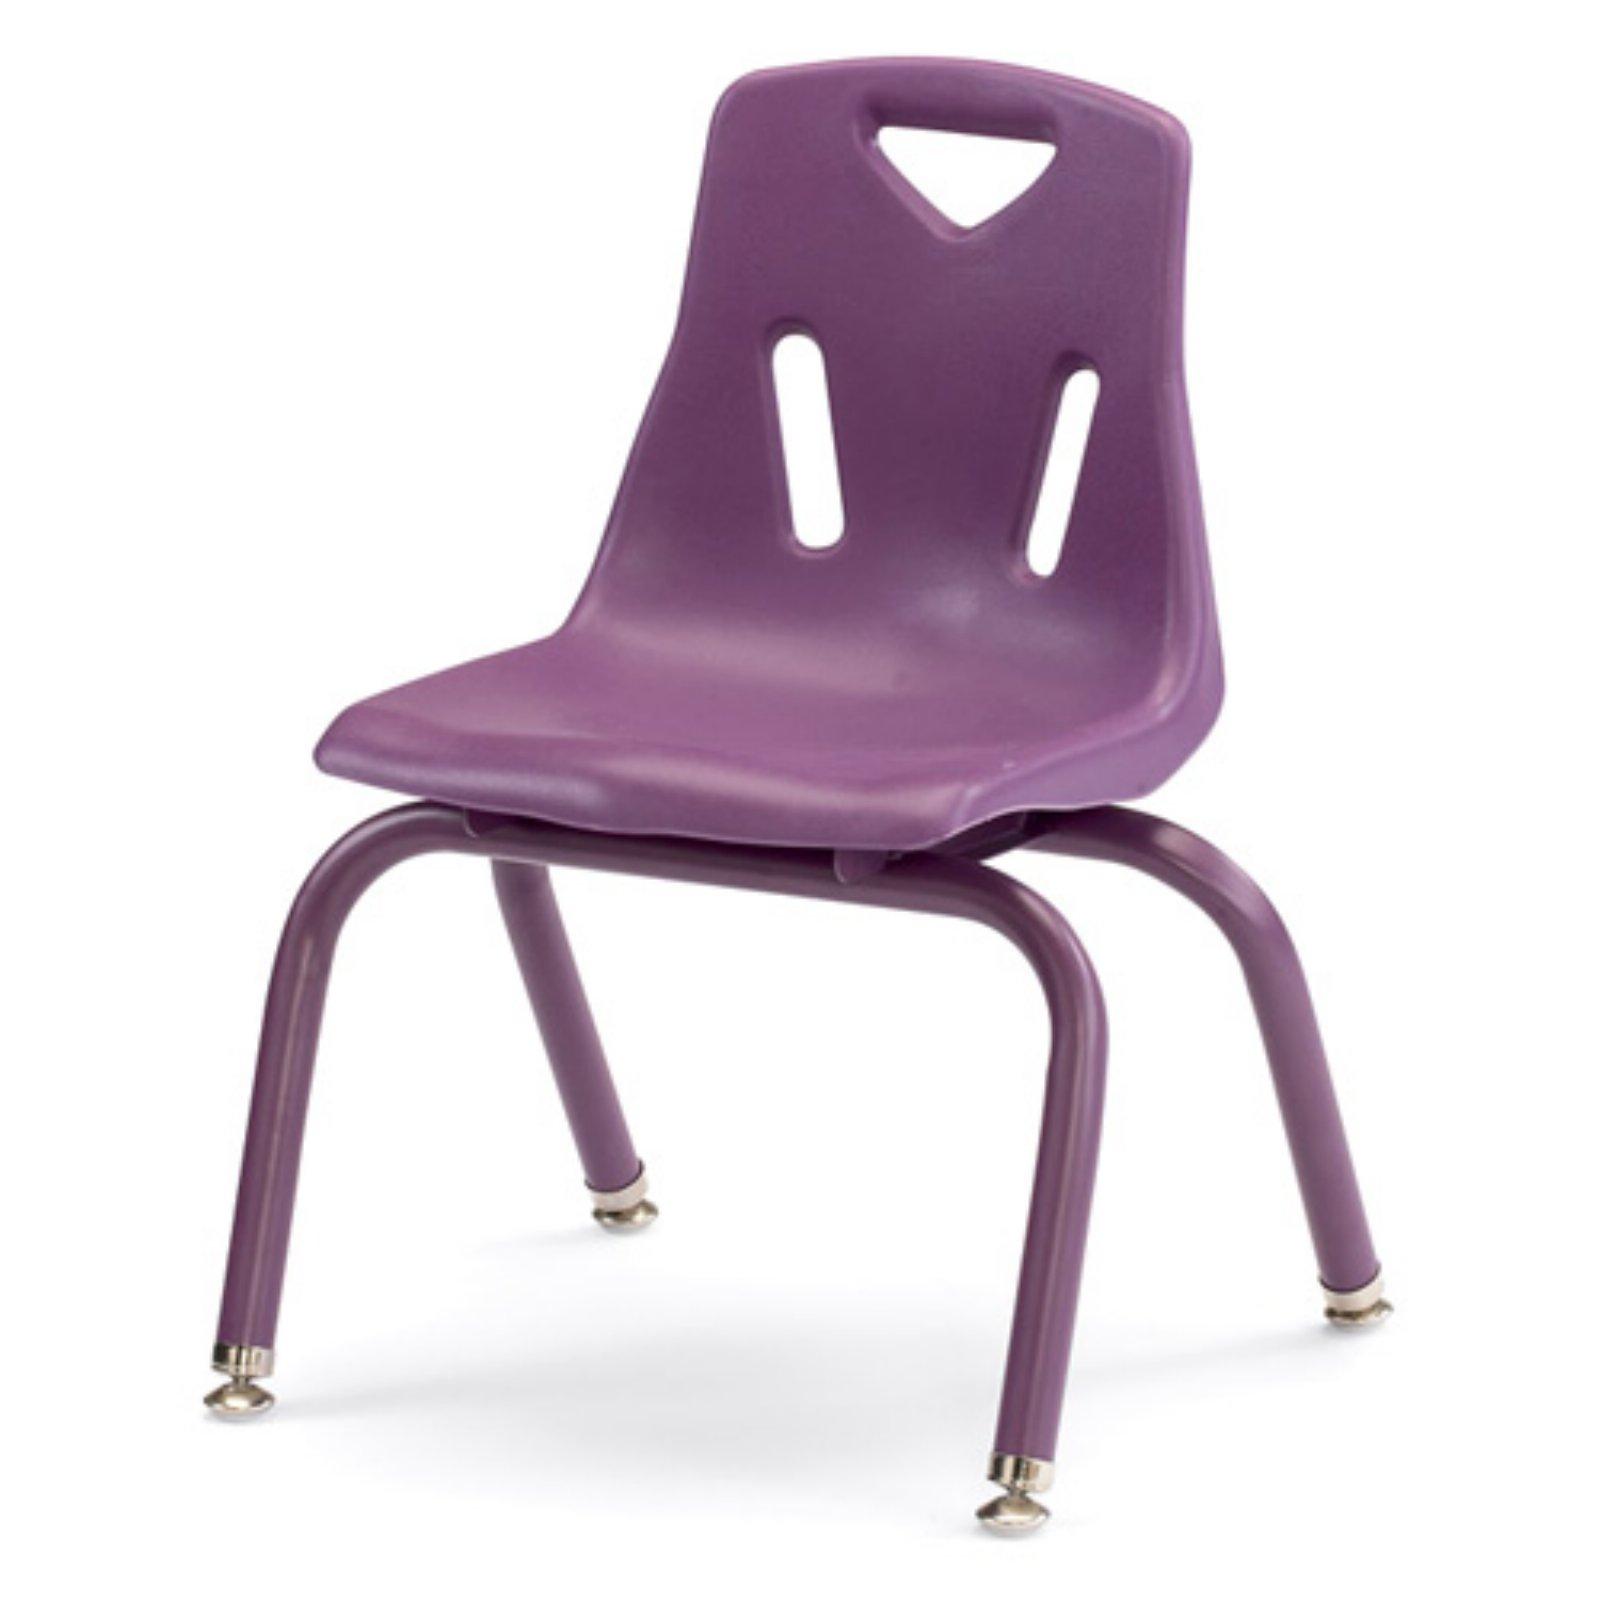 Jonti-Craft Berries Plastic Chairs with Powder Coated Legs